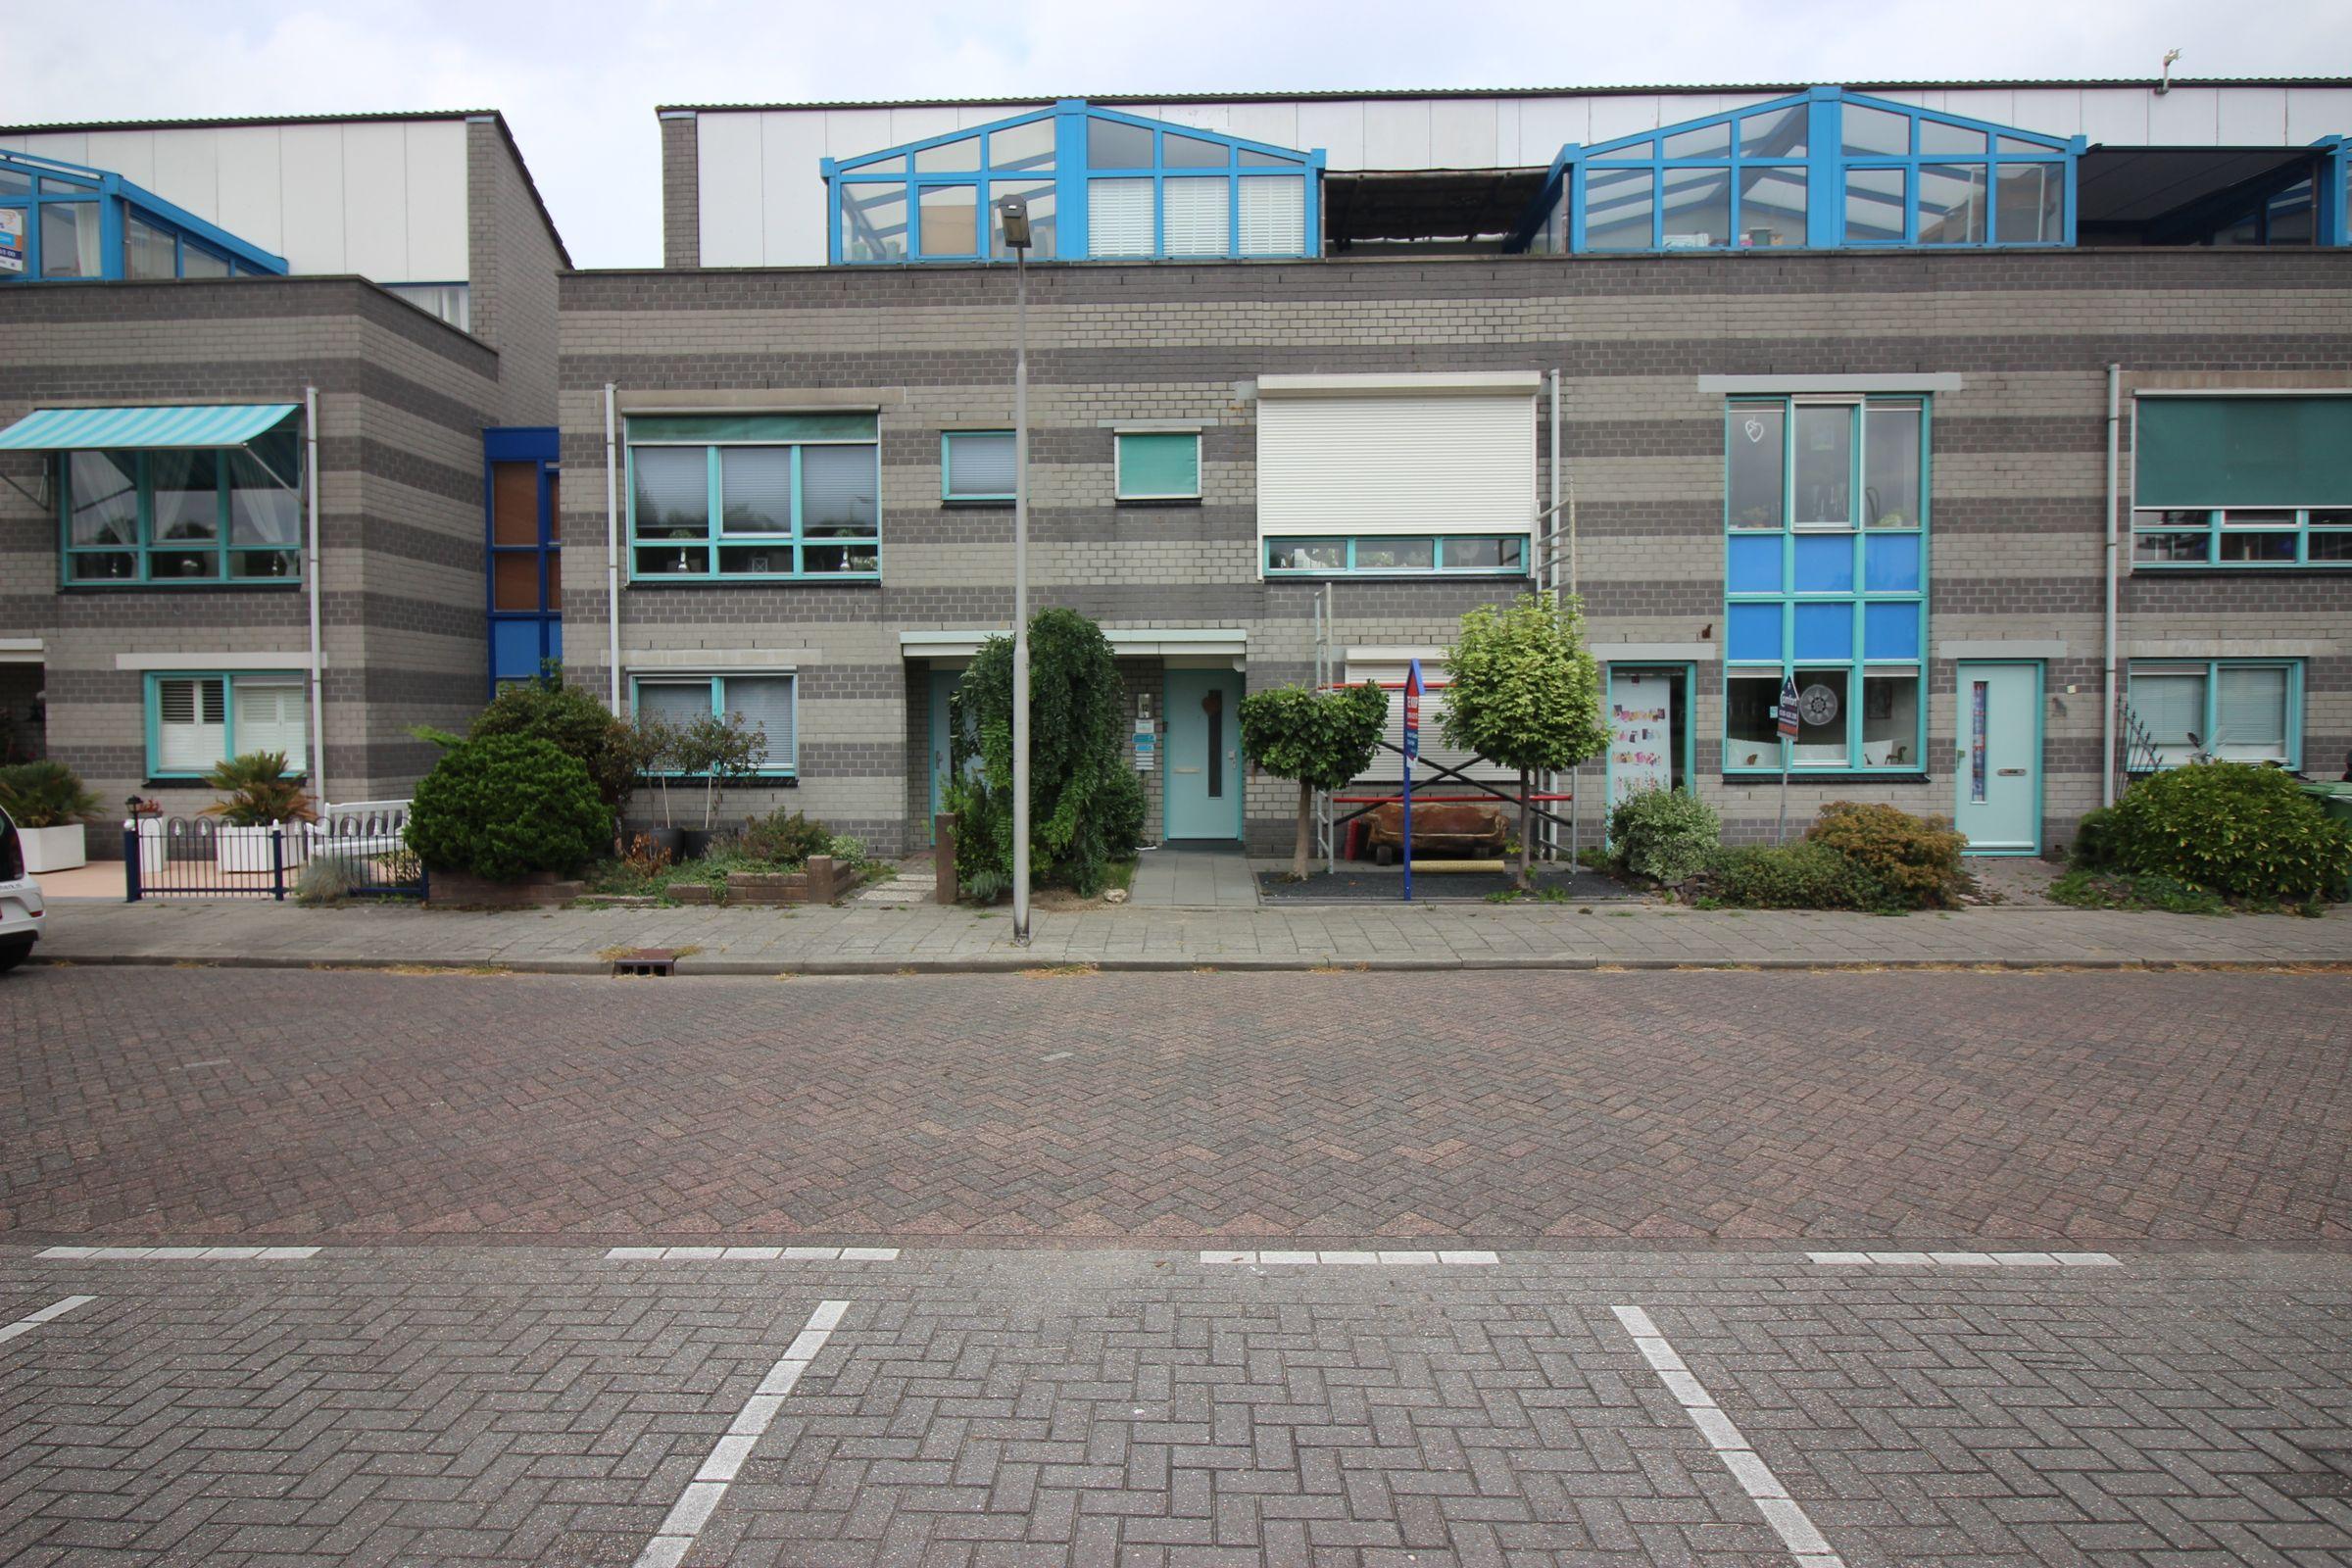 Erasmuslaan 12, Ridderkerk